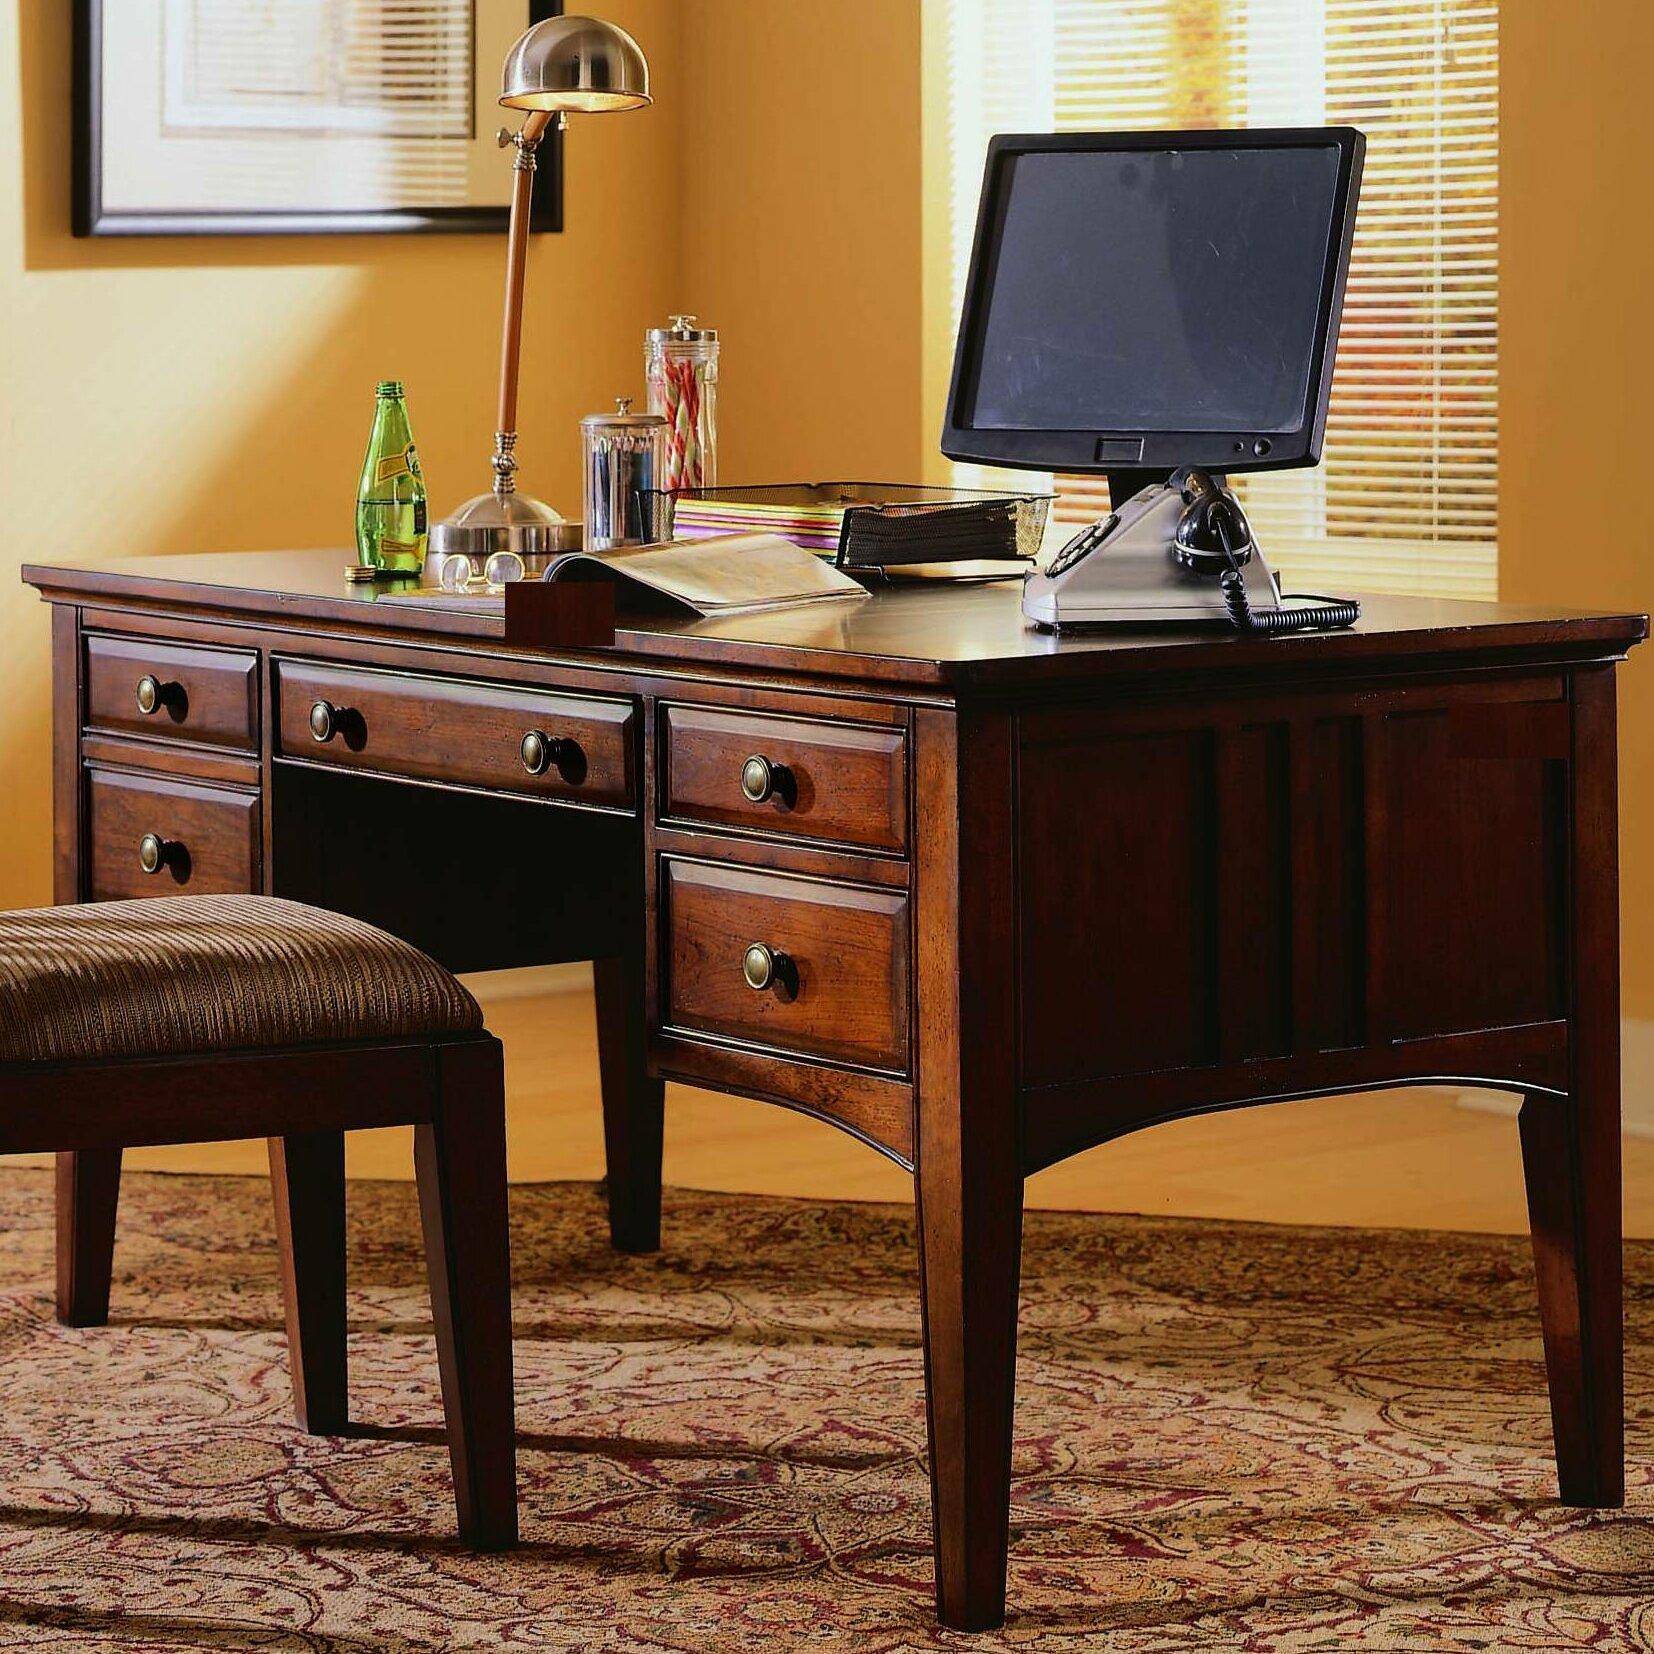 hooker furniture bedford row keyboard tray executive desk